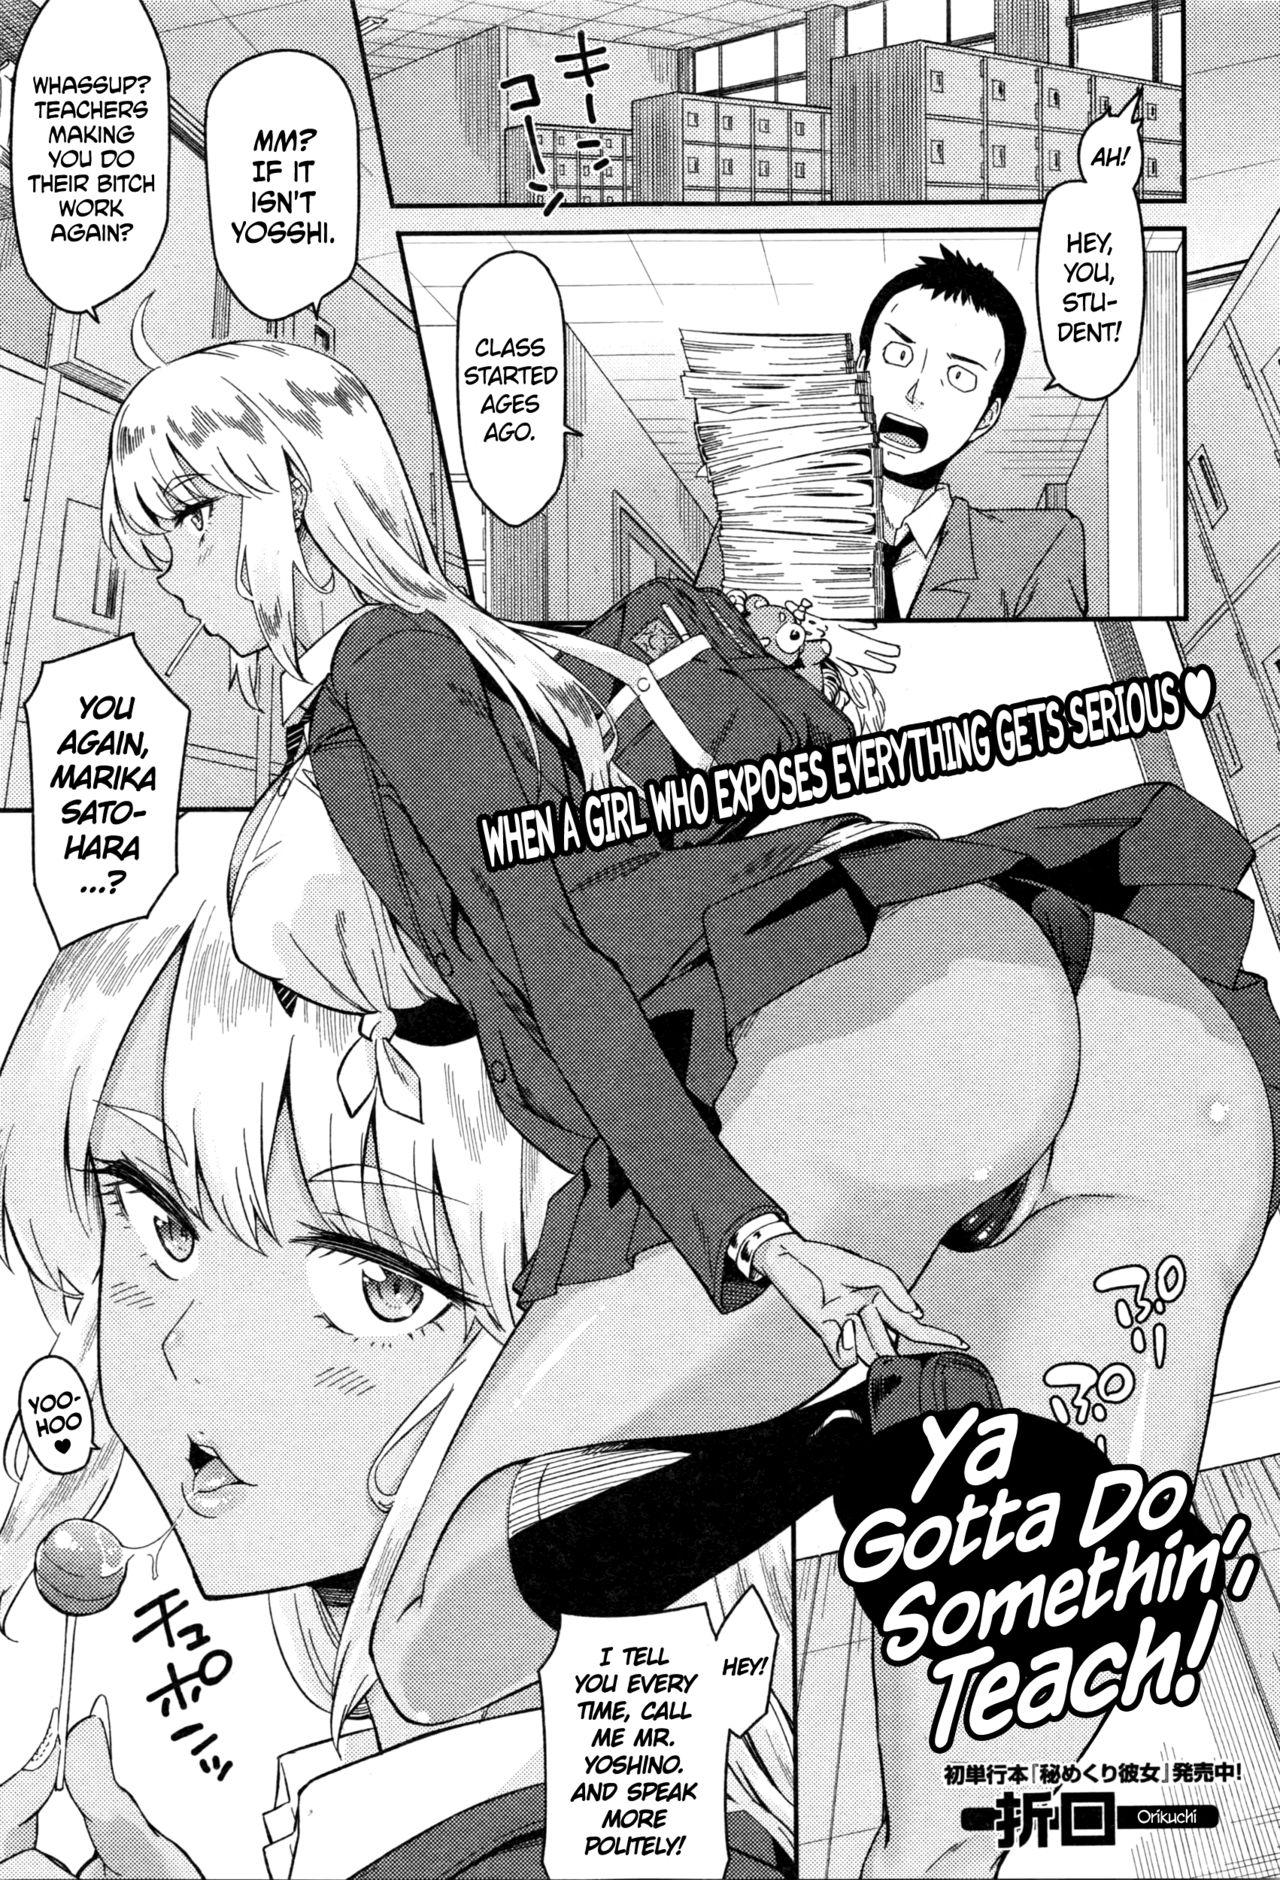 Nantoka Shite yo Sense! | Ya Gotta Do Somethin', Teach! 0